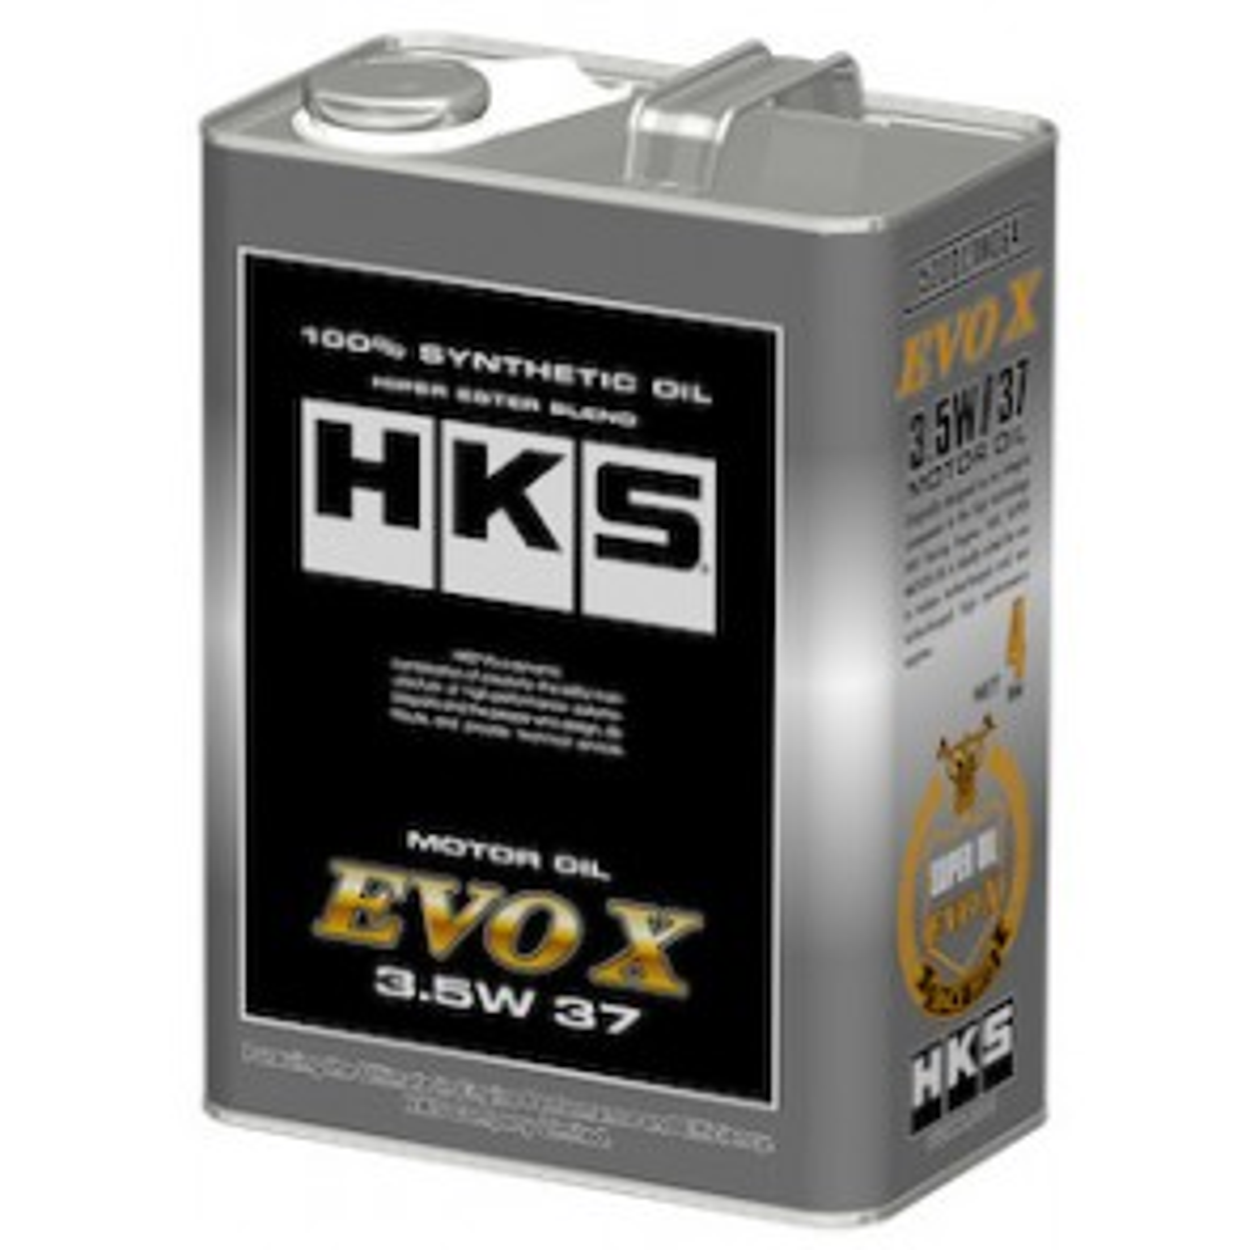 HKS Super Oil Mitsubishi Lancer Evolution EVO X 10 4B11 3.5W-37 1Ltr / 4Ltr / 20Ltr